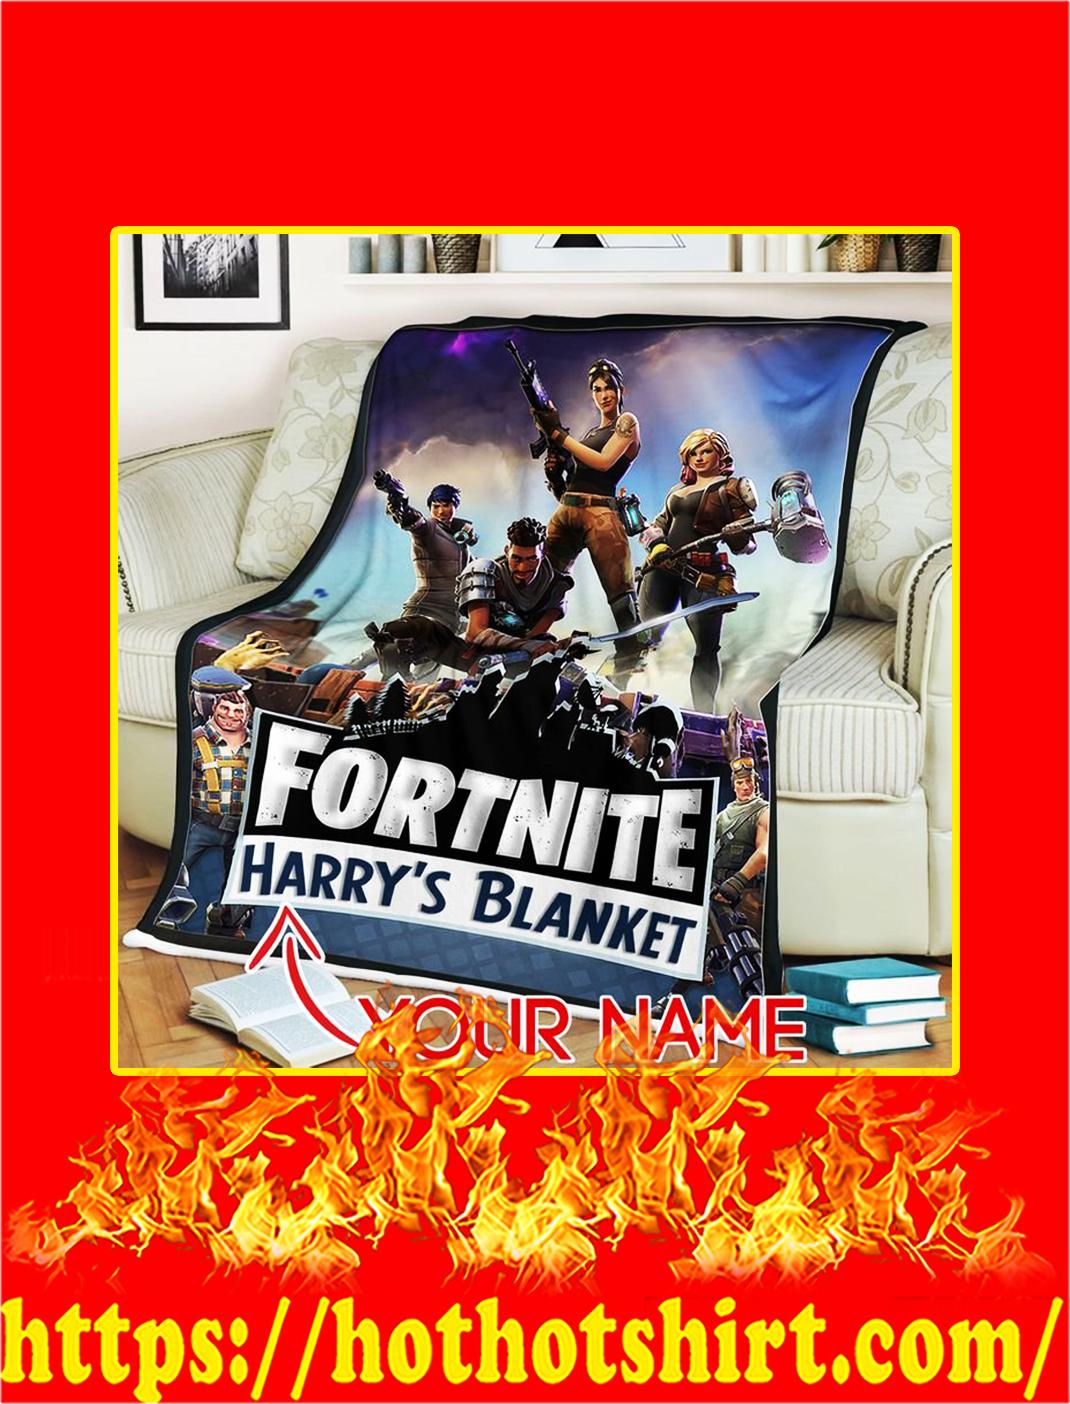 Fortnite Gaming Custom Name Personalize Blanket